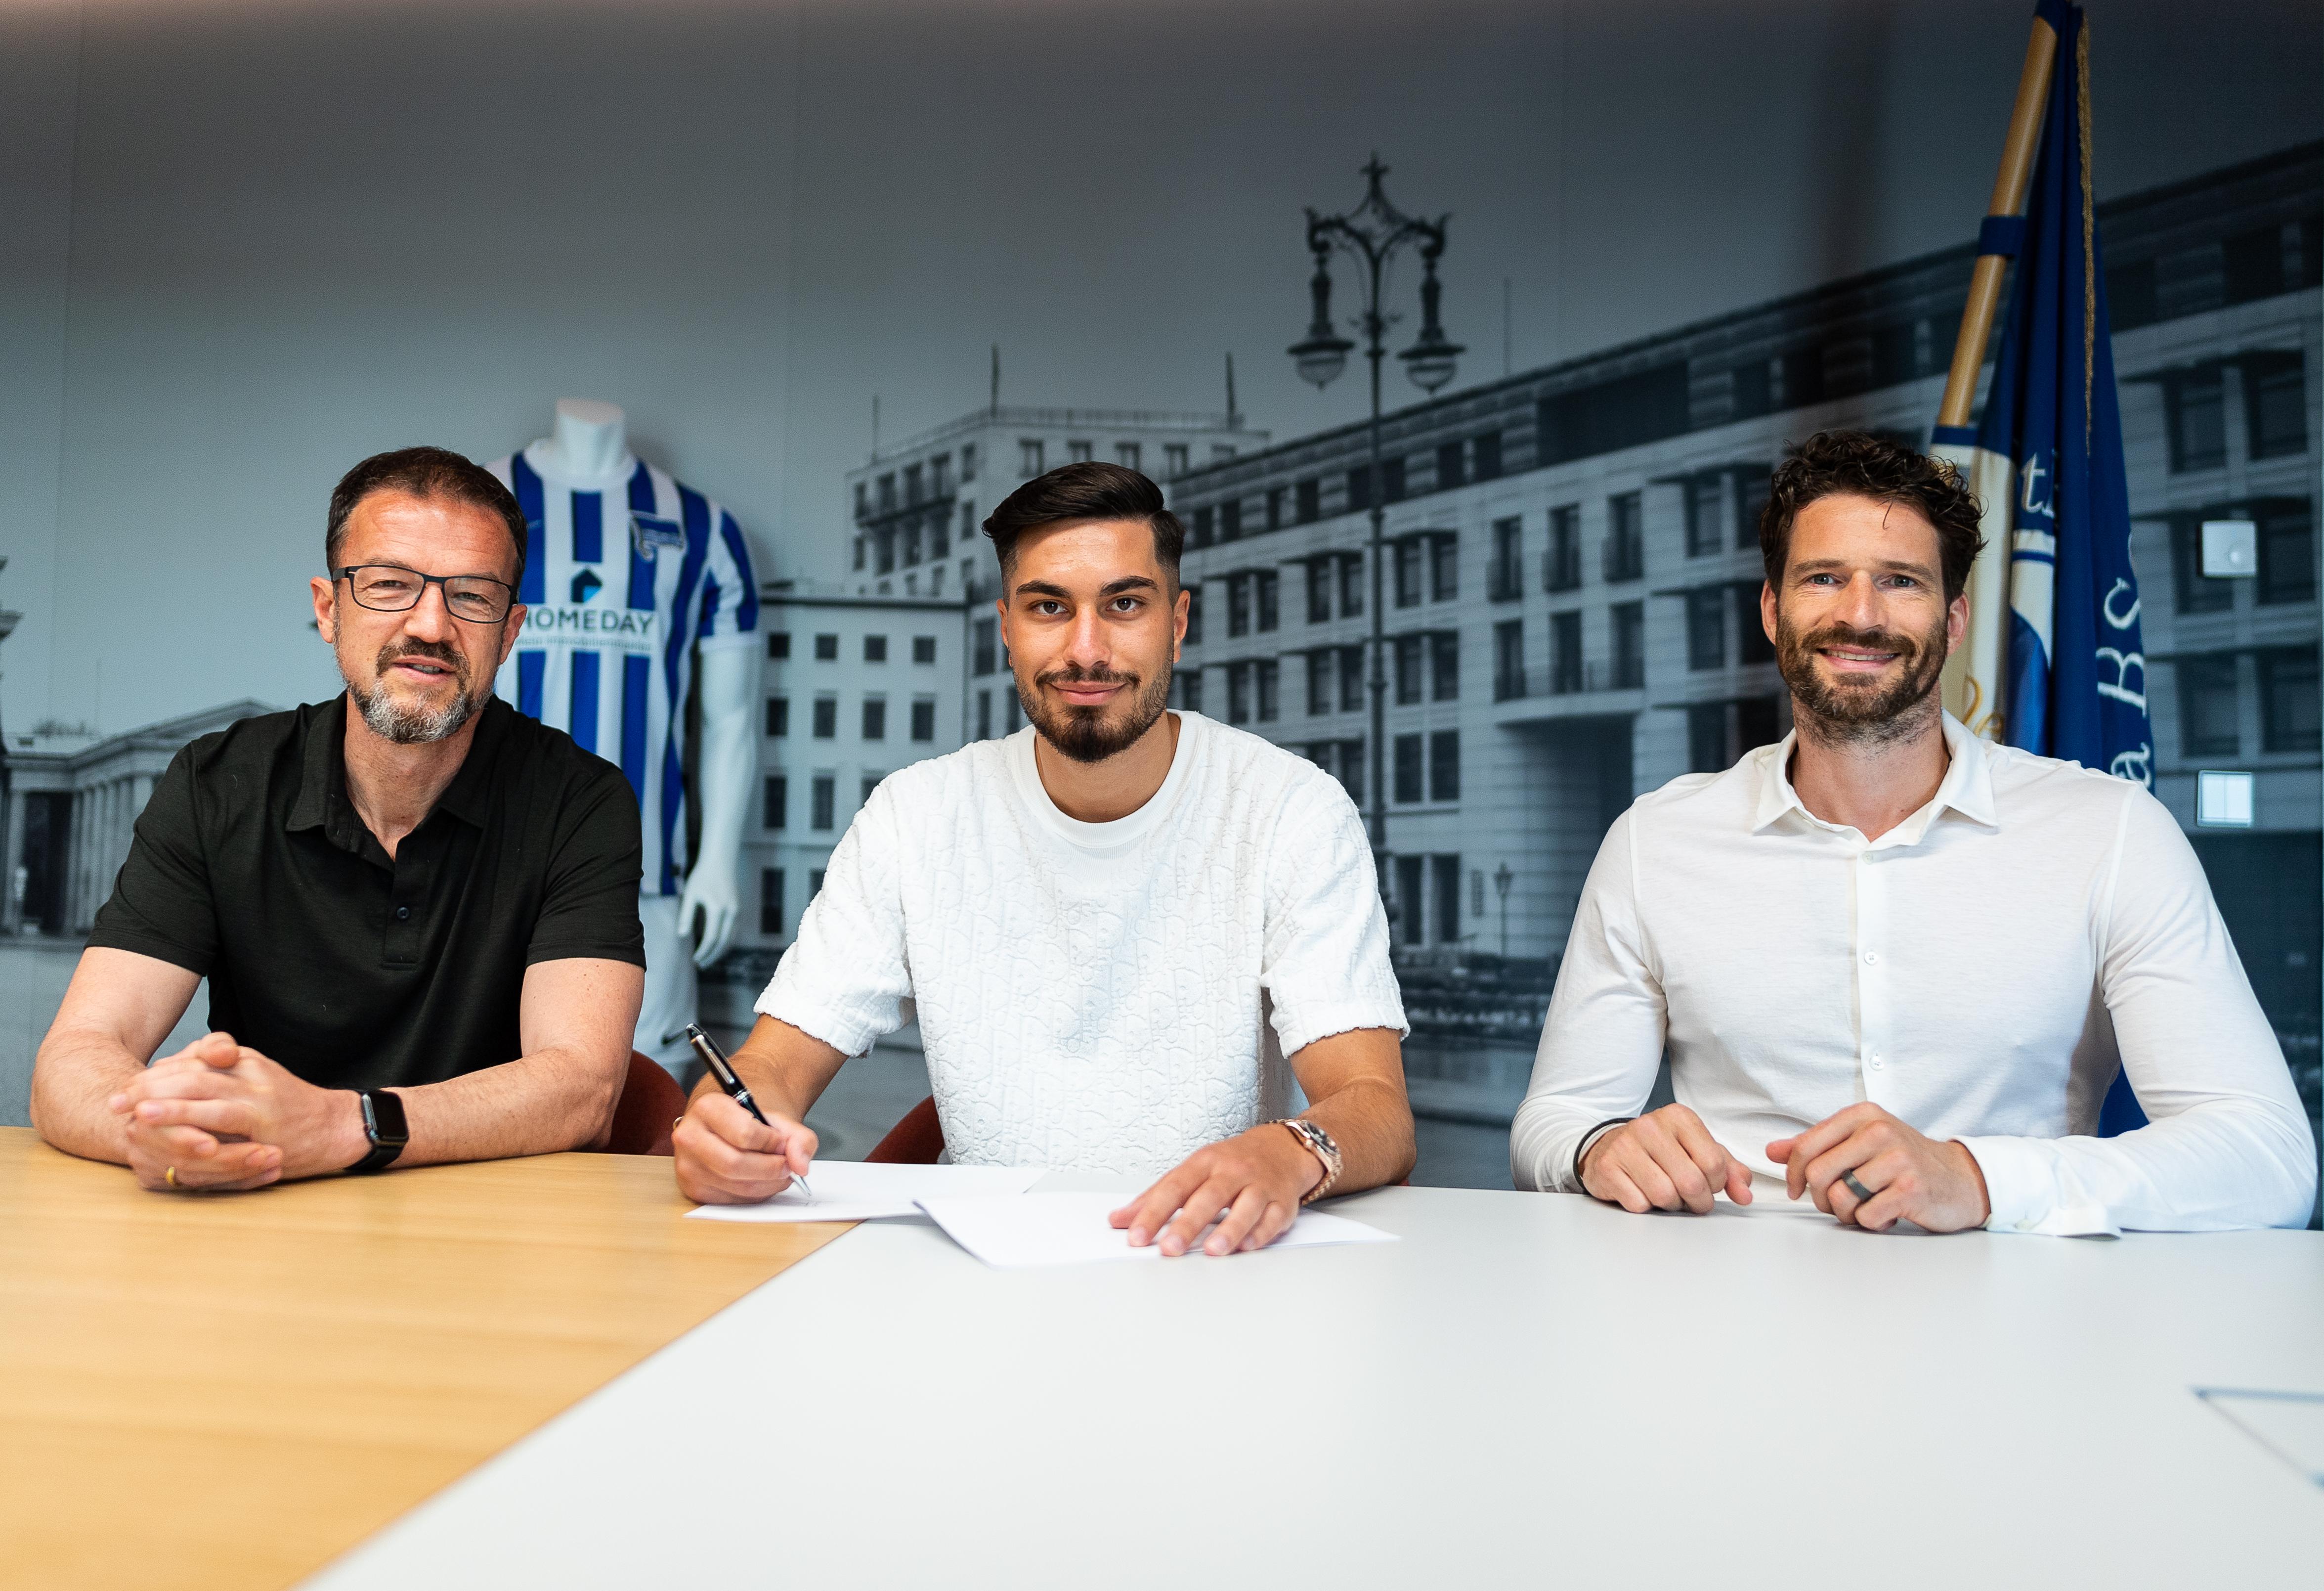 Suat Serdar signing his contract alongside Fredi Bobic and Arne Friedrich.